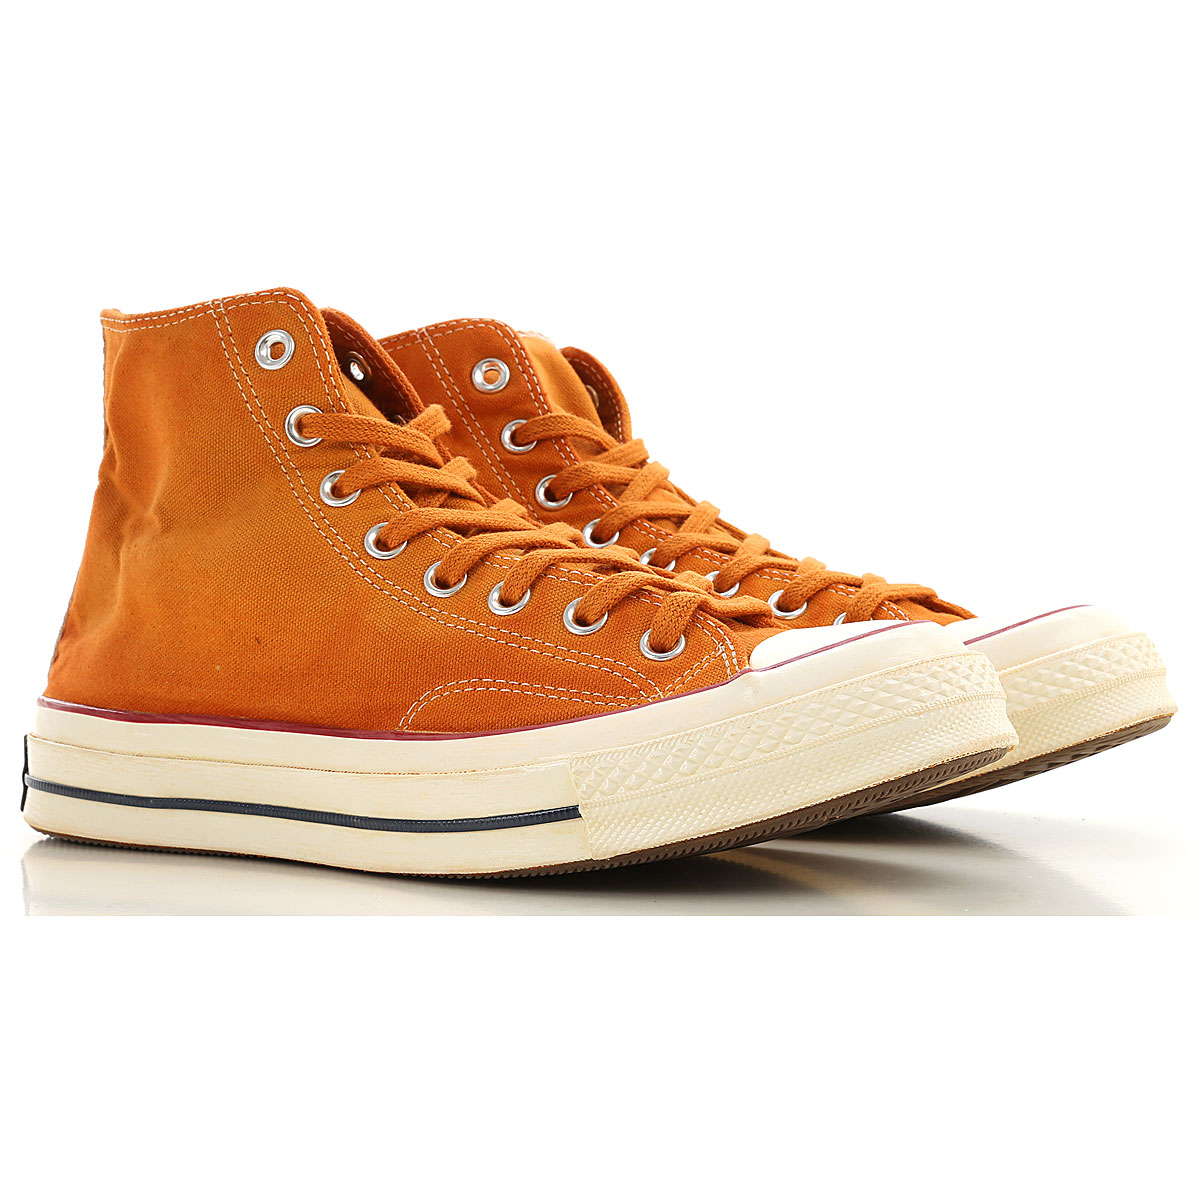 Converse Sneakers for Men On Sale, Pumpkin, Textile, 2019, 10 10.5 7.5 8 9.5